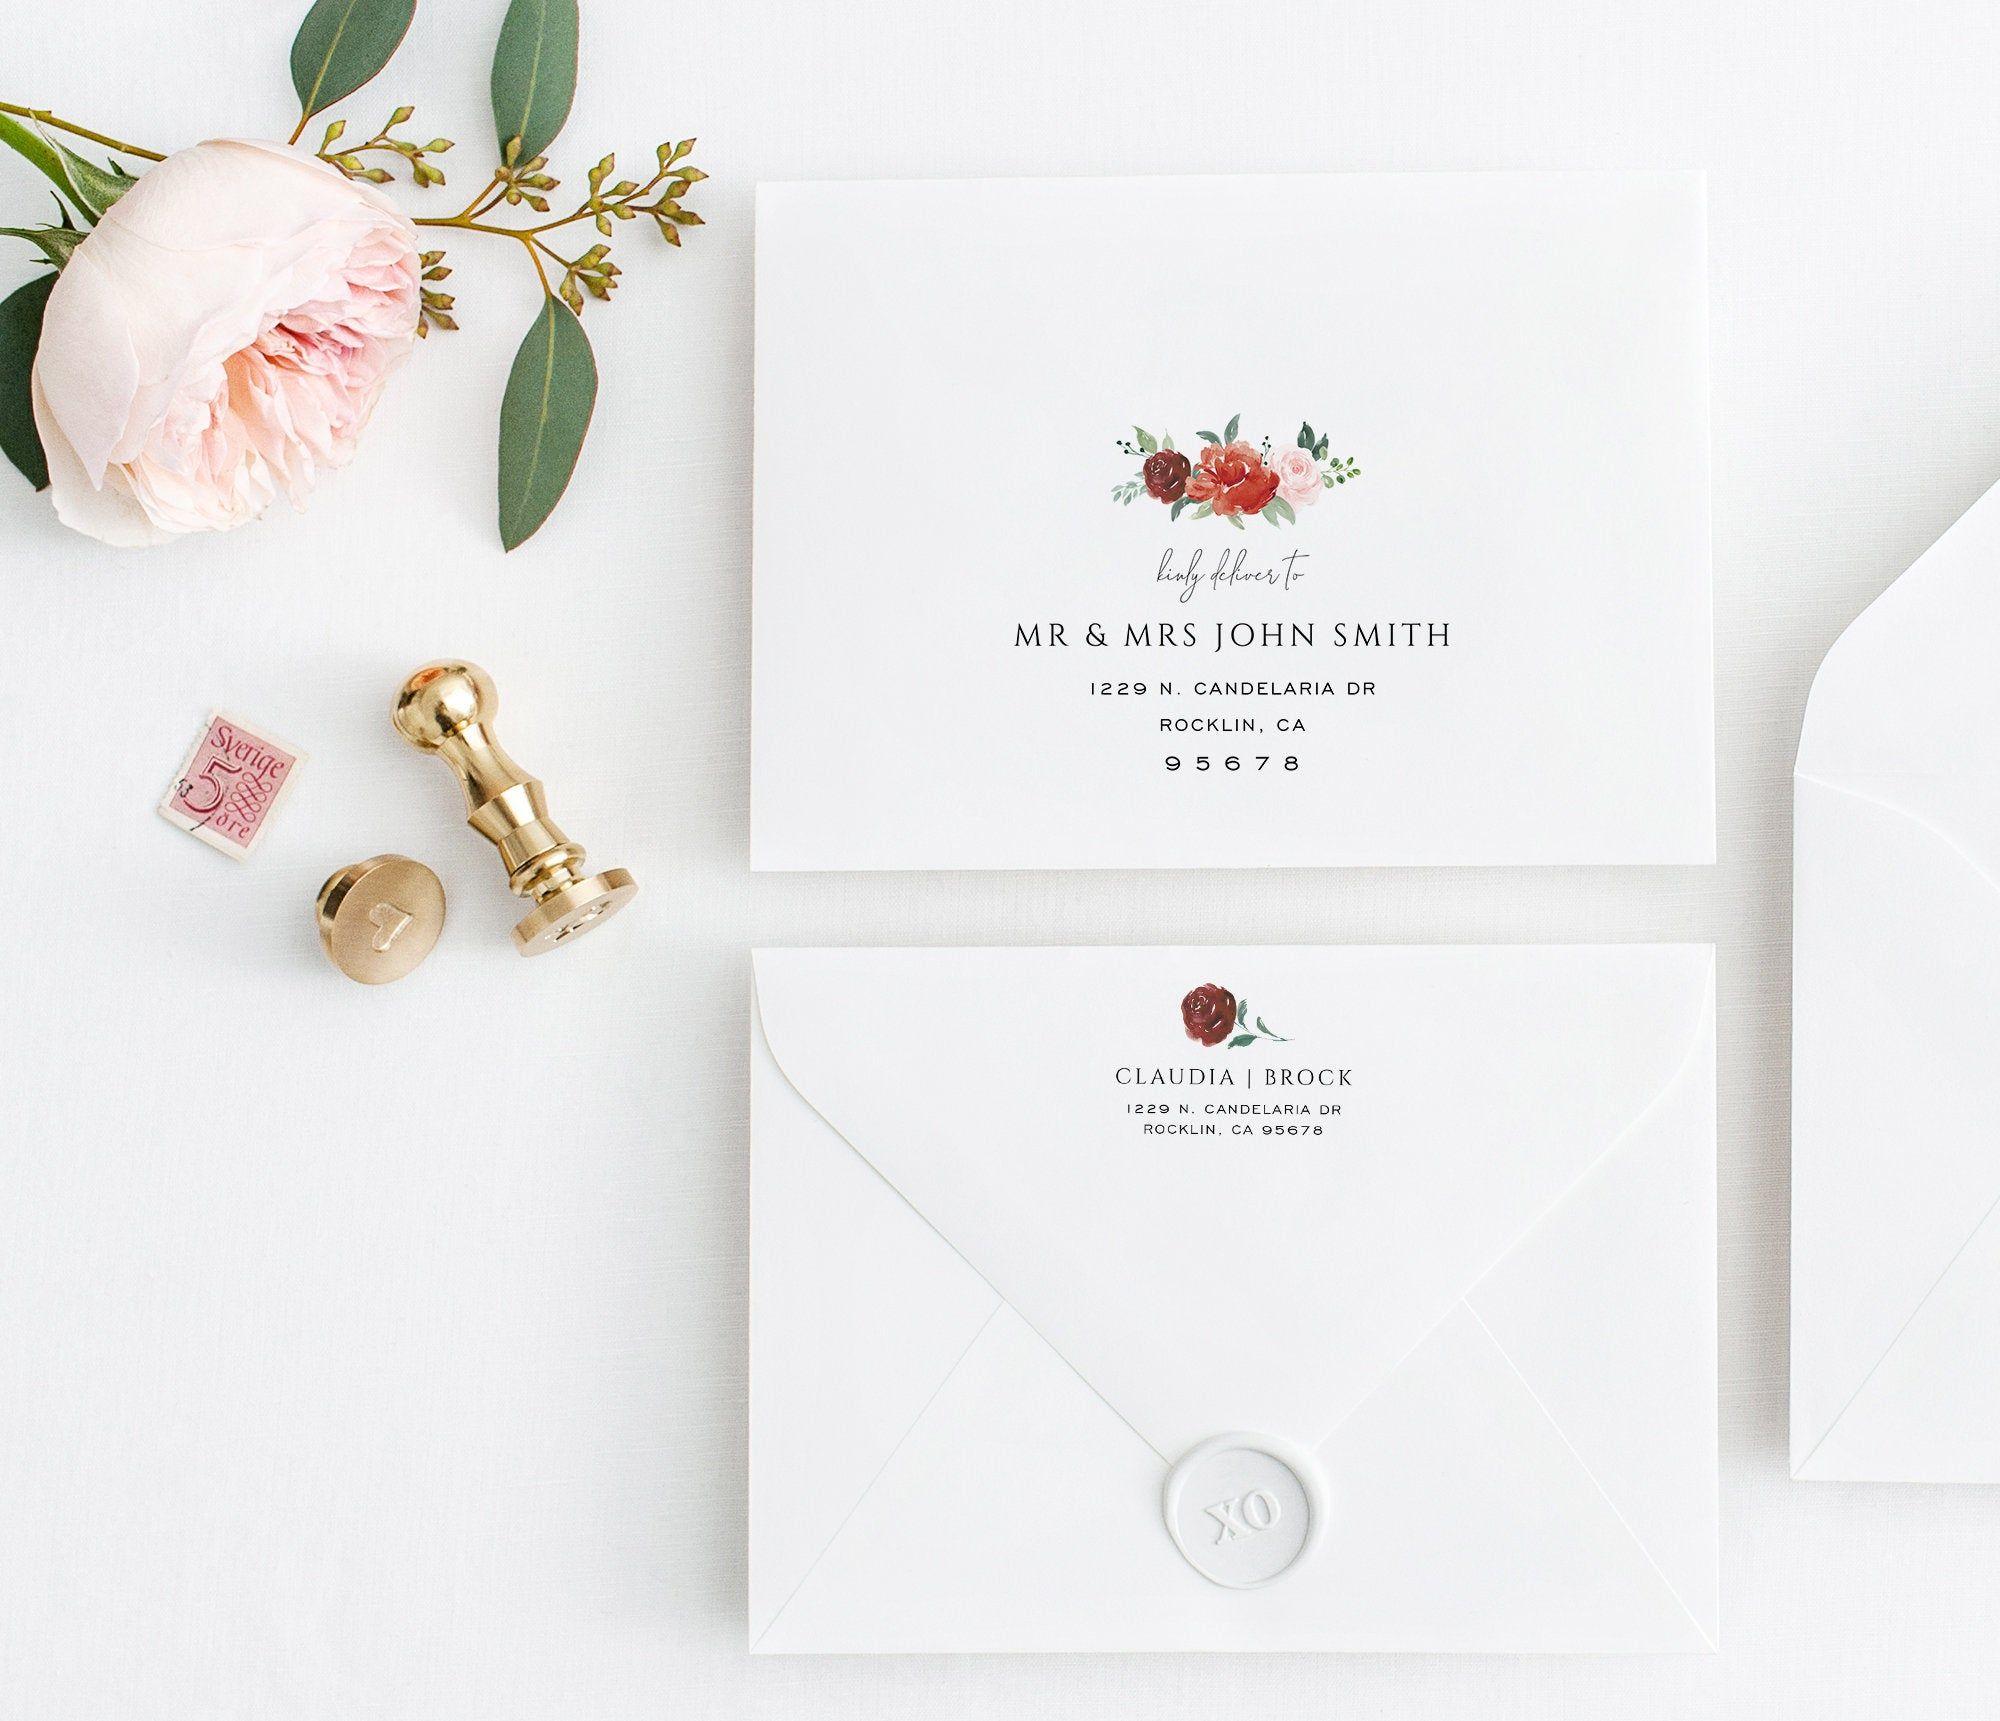 Red Burgundy Flower Envelope Template Envelope Printable Etsy Wedding Envelopes Envelope Template Burgundy Flowers